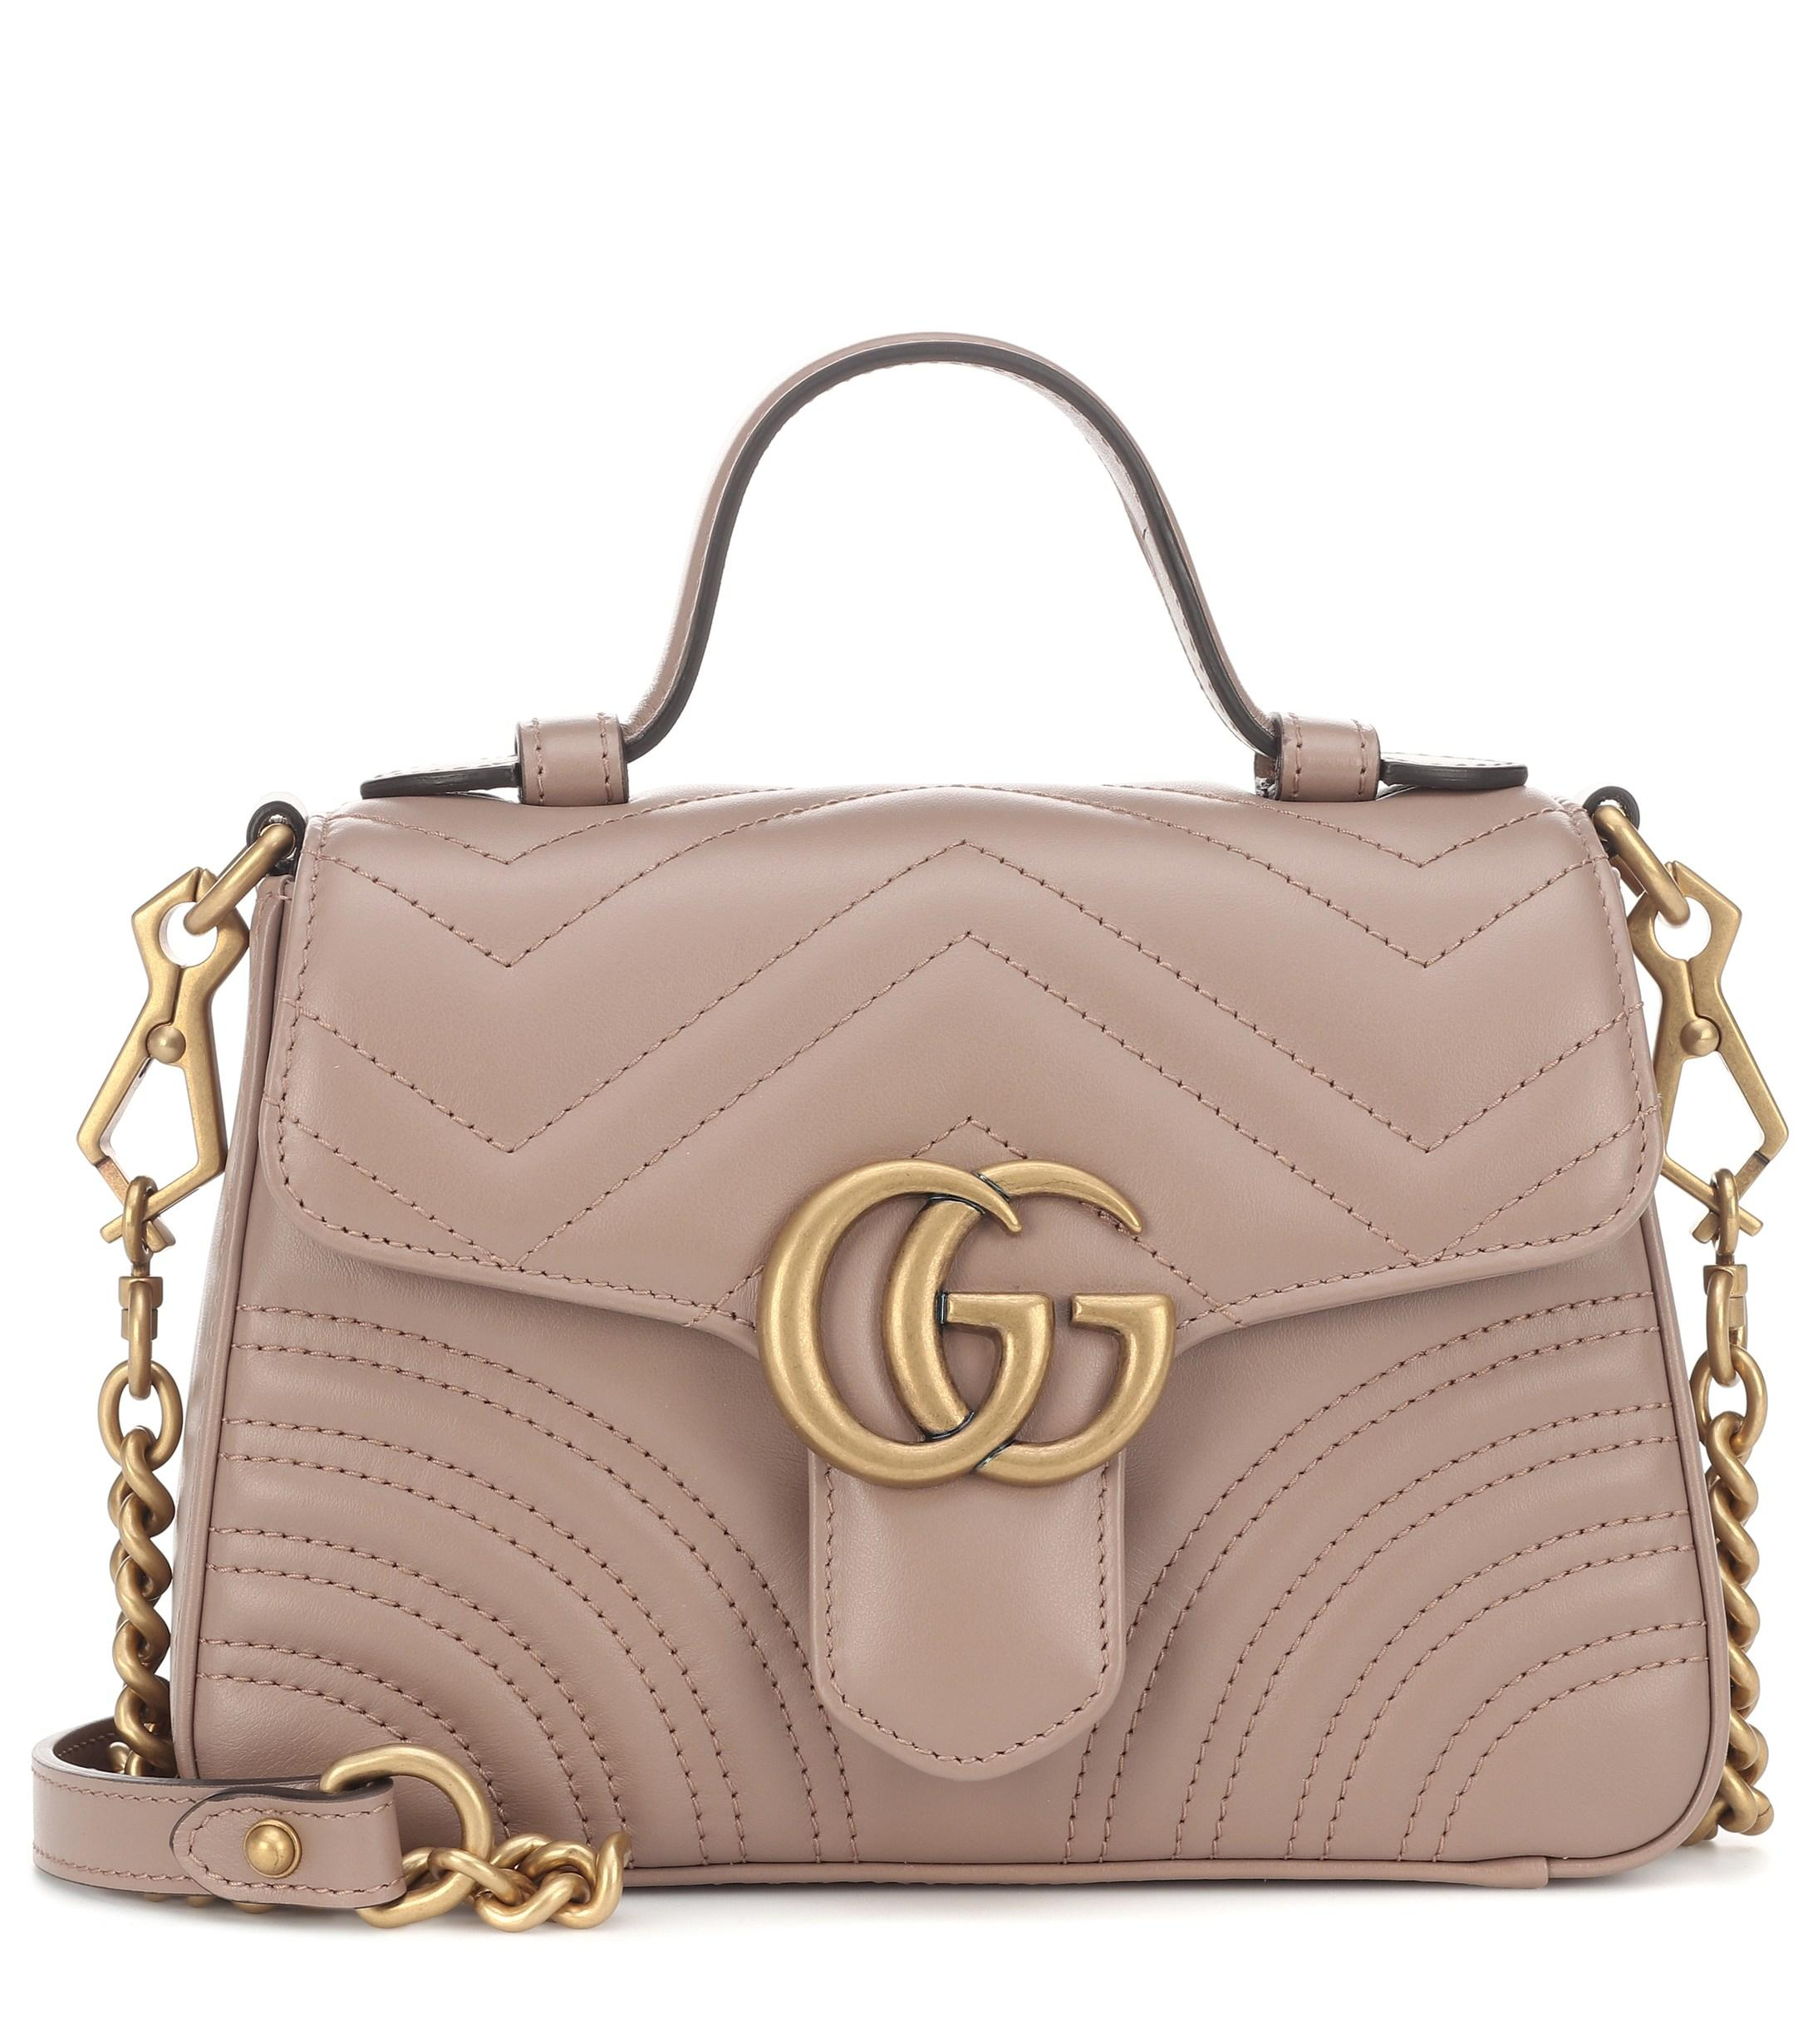 007812ce7 ... Gucci - Natural GG Marmont Mini Shoulder Bag - Lyst. Visit Mytheresa.  Tap to visit site